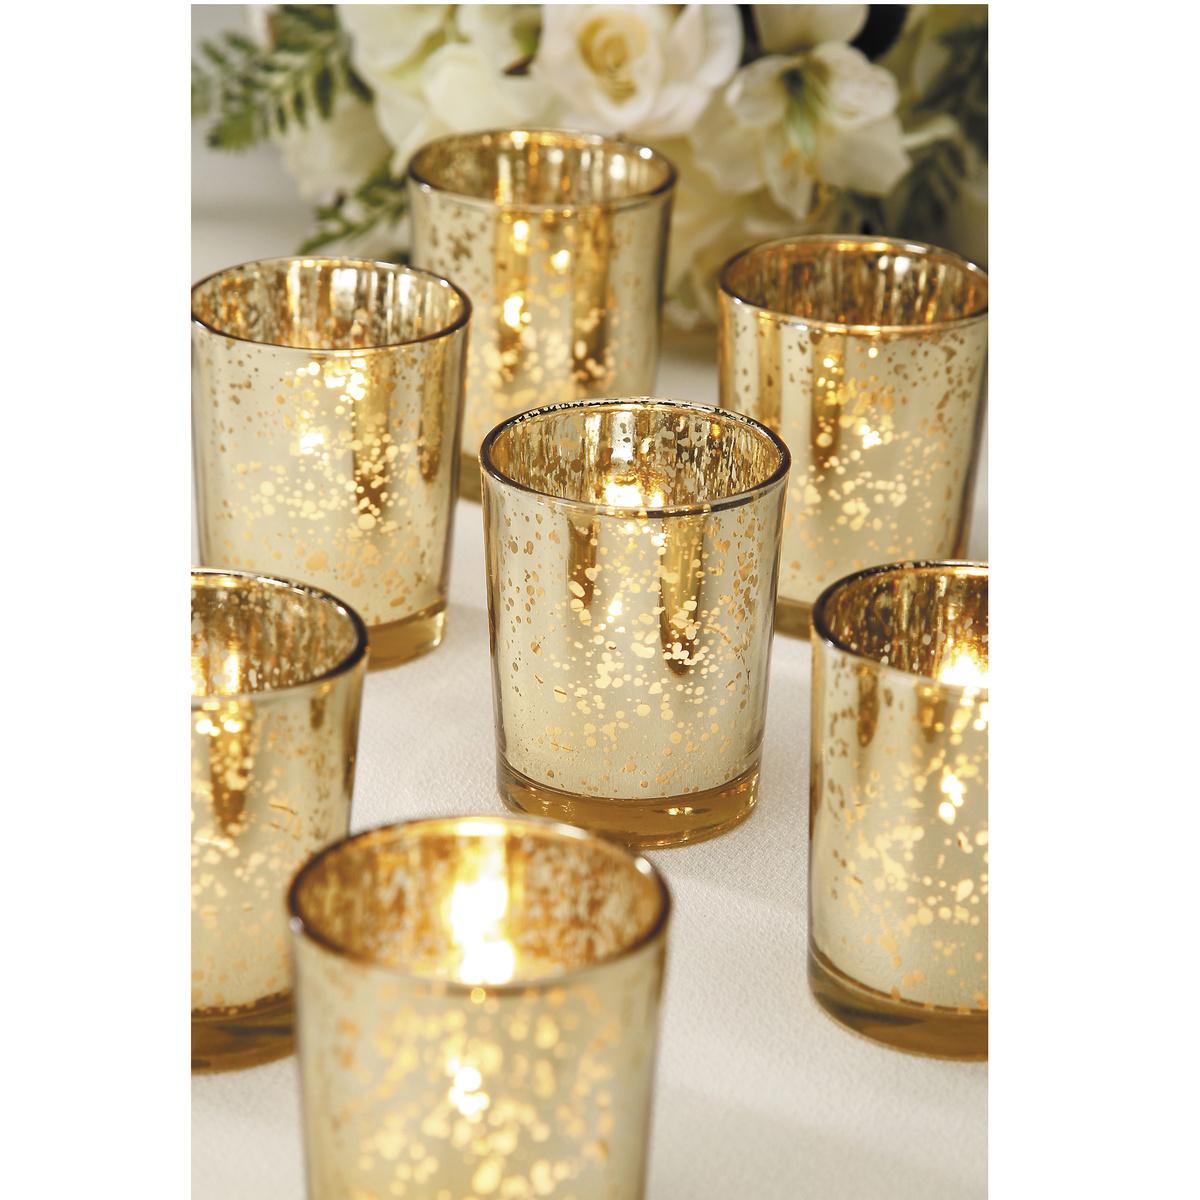 Gold Plated Glass Votives - Wedding Decor | JOANN